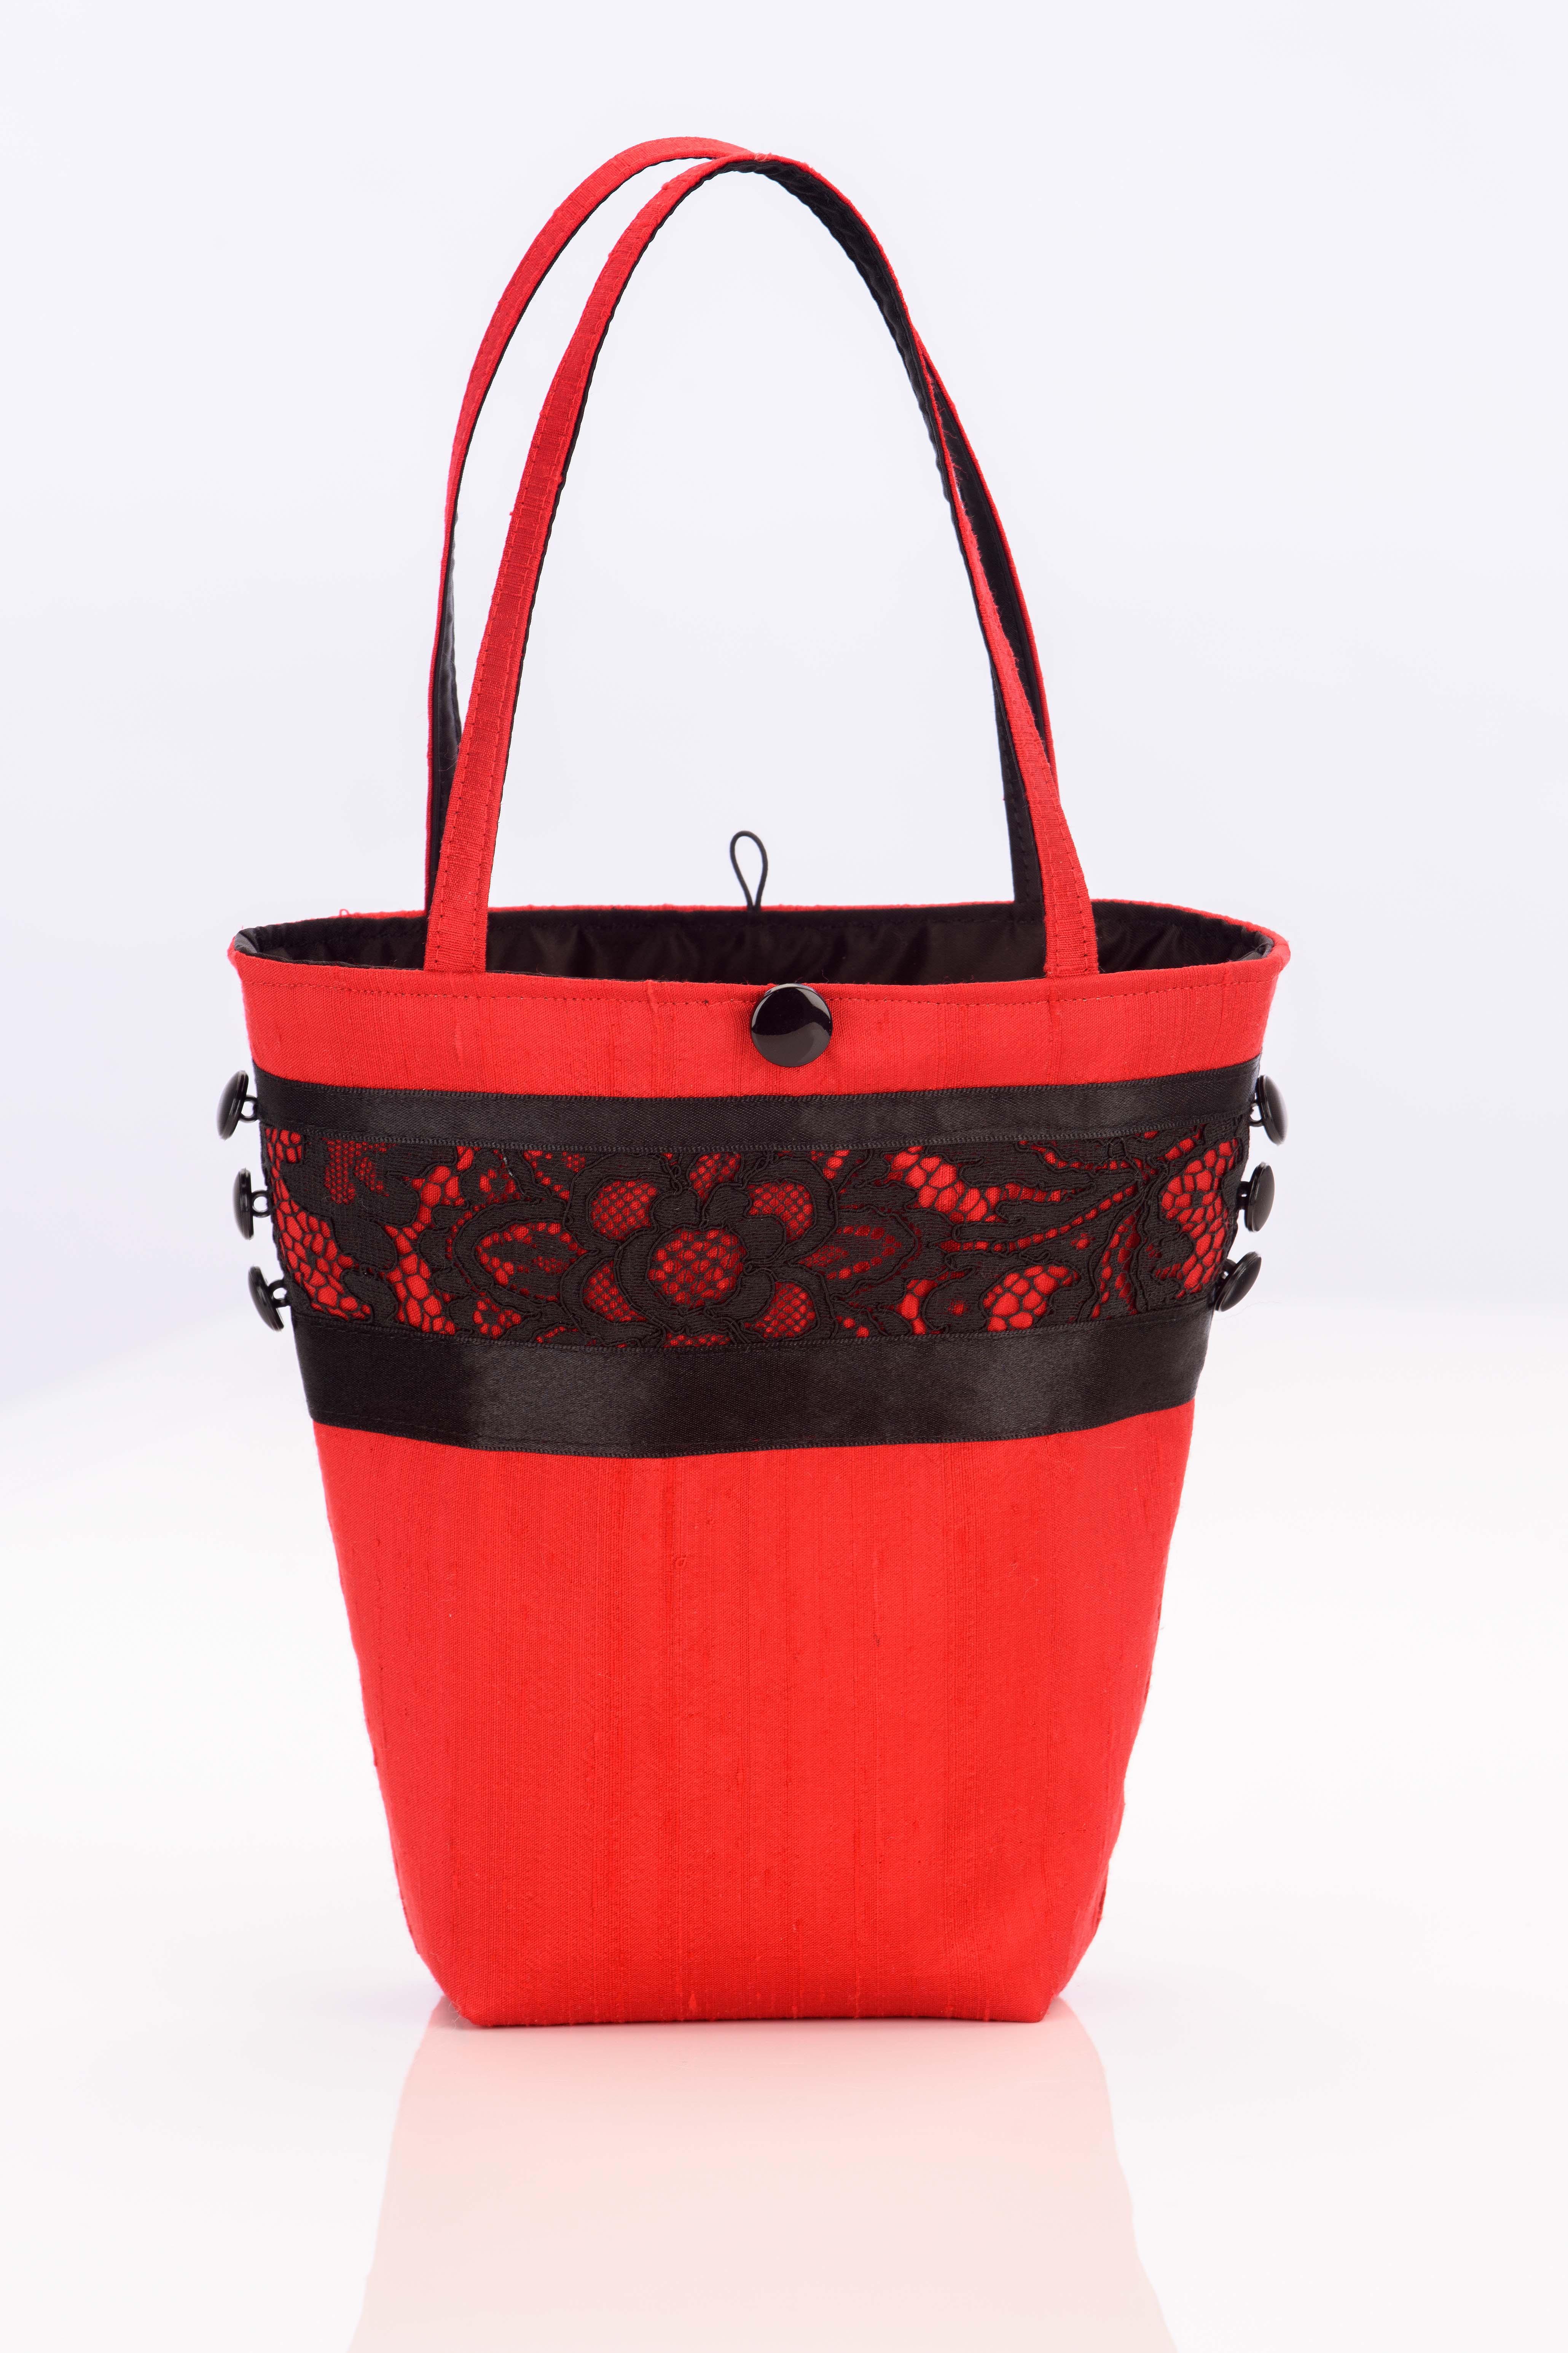 Red silk handbag with vintage black lace